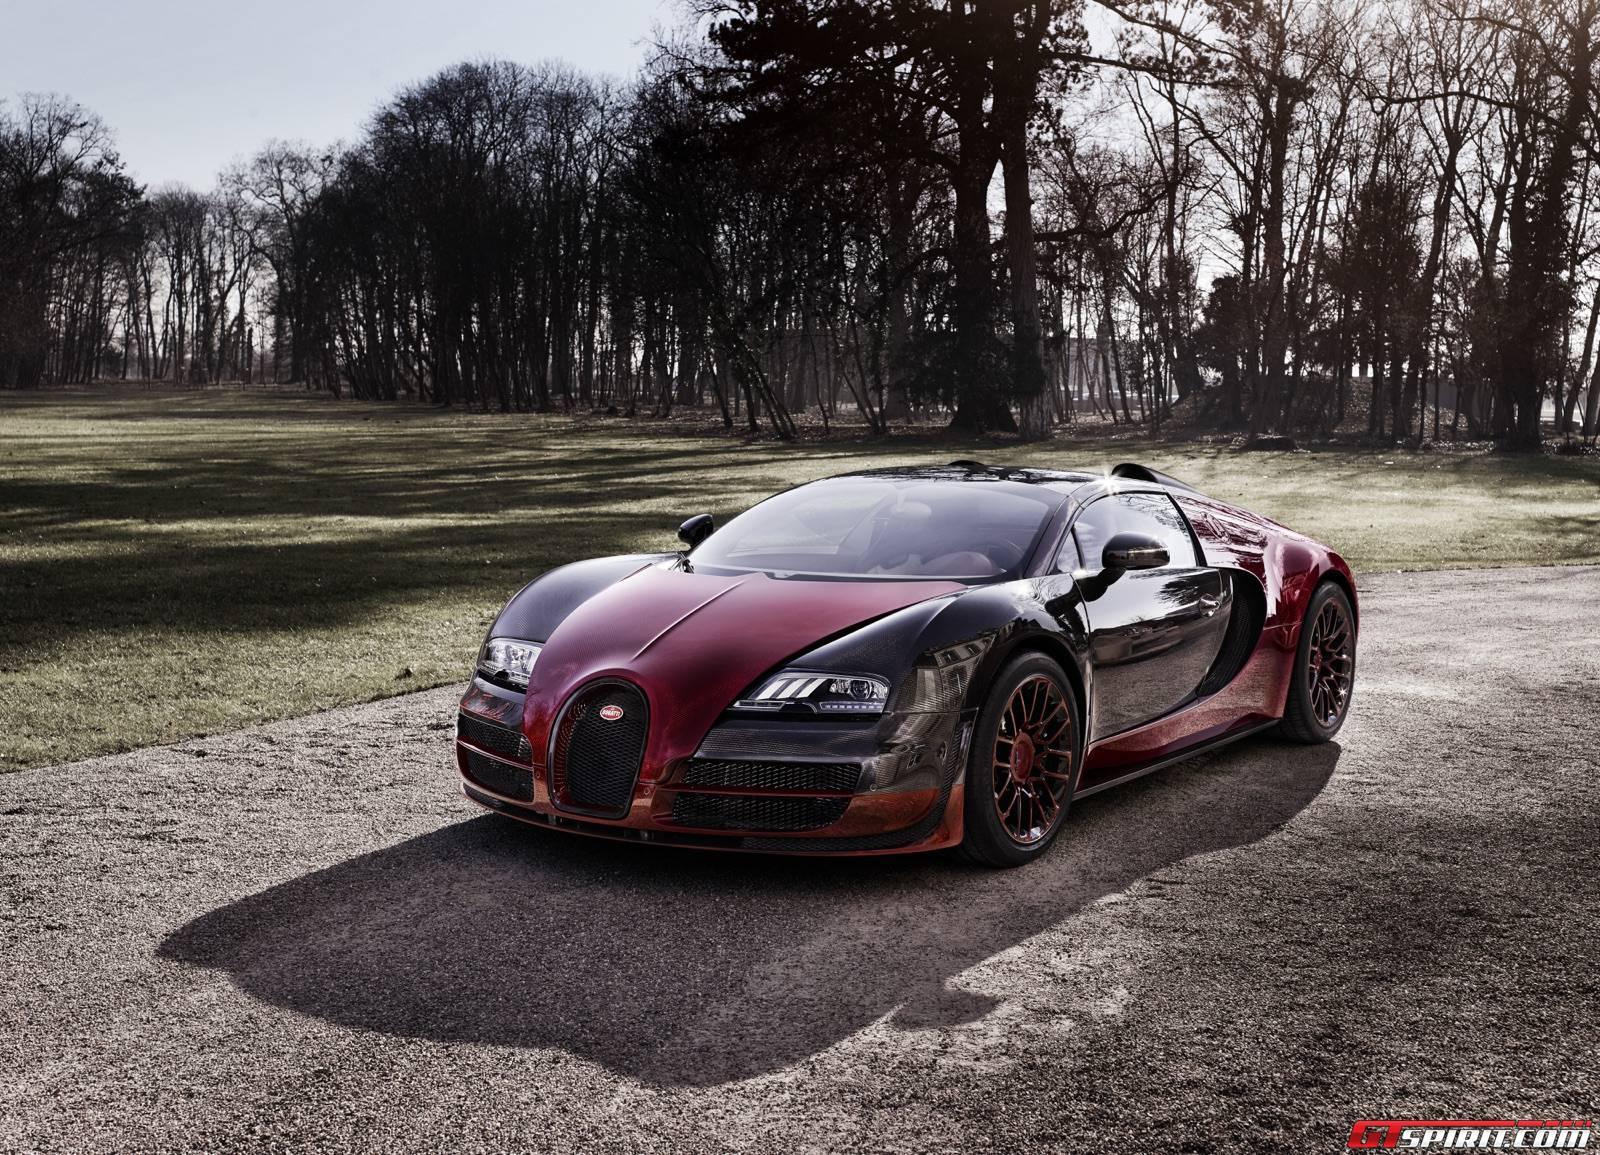 Veyron W16 Engine Bugatti Diagram Successor To Retain Gtspirit 1600x1155